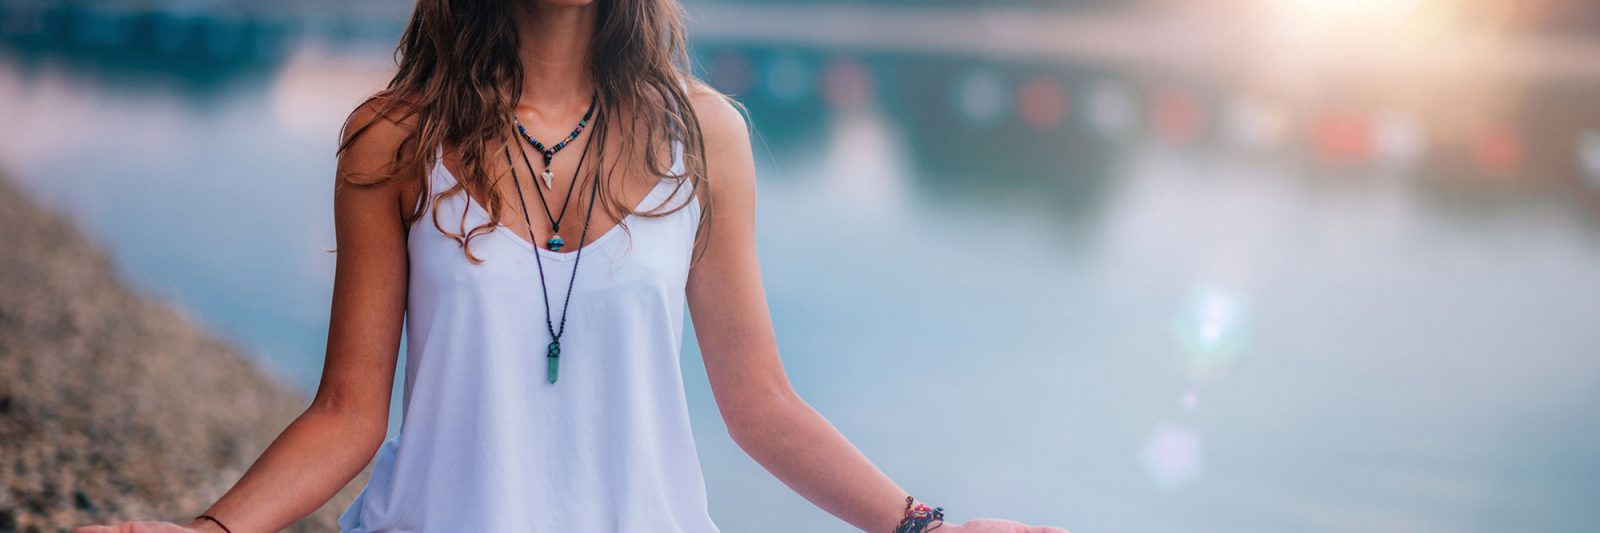 meditation benefits practice